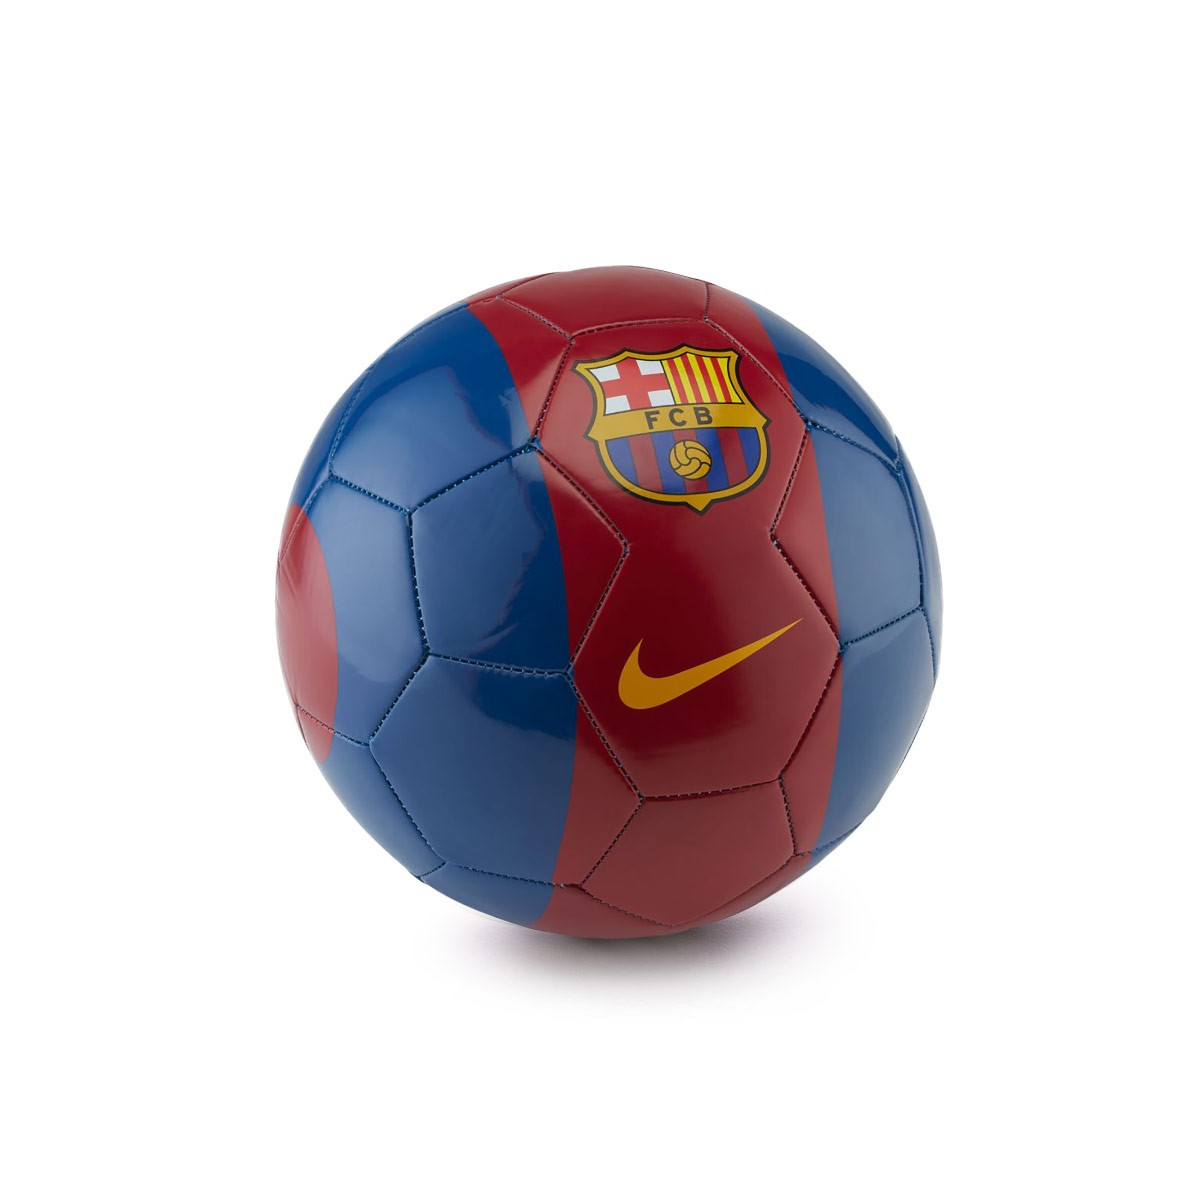 Ball Nike FC Barcelona Sports 2018-2019 Storm red-Gym blue ... 34eaf00c17129